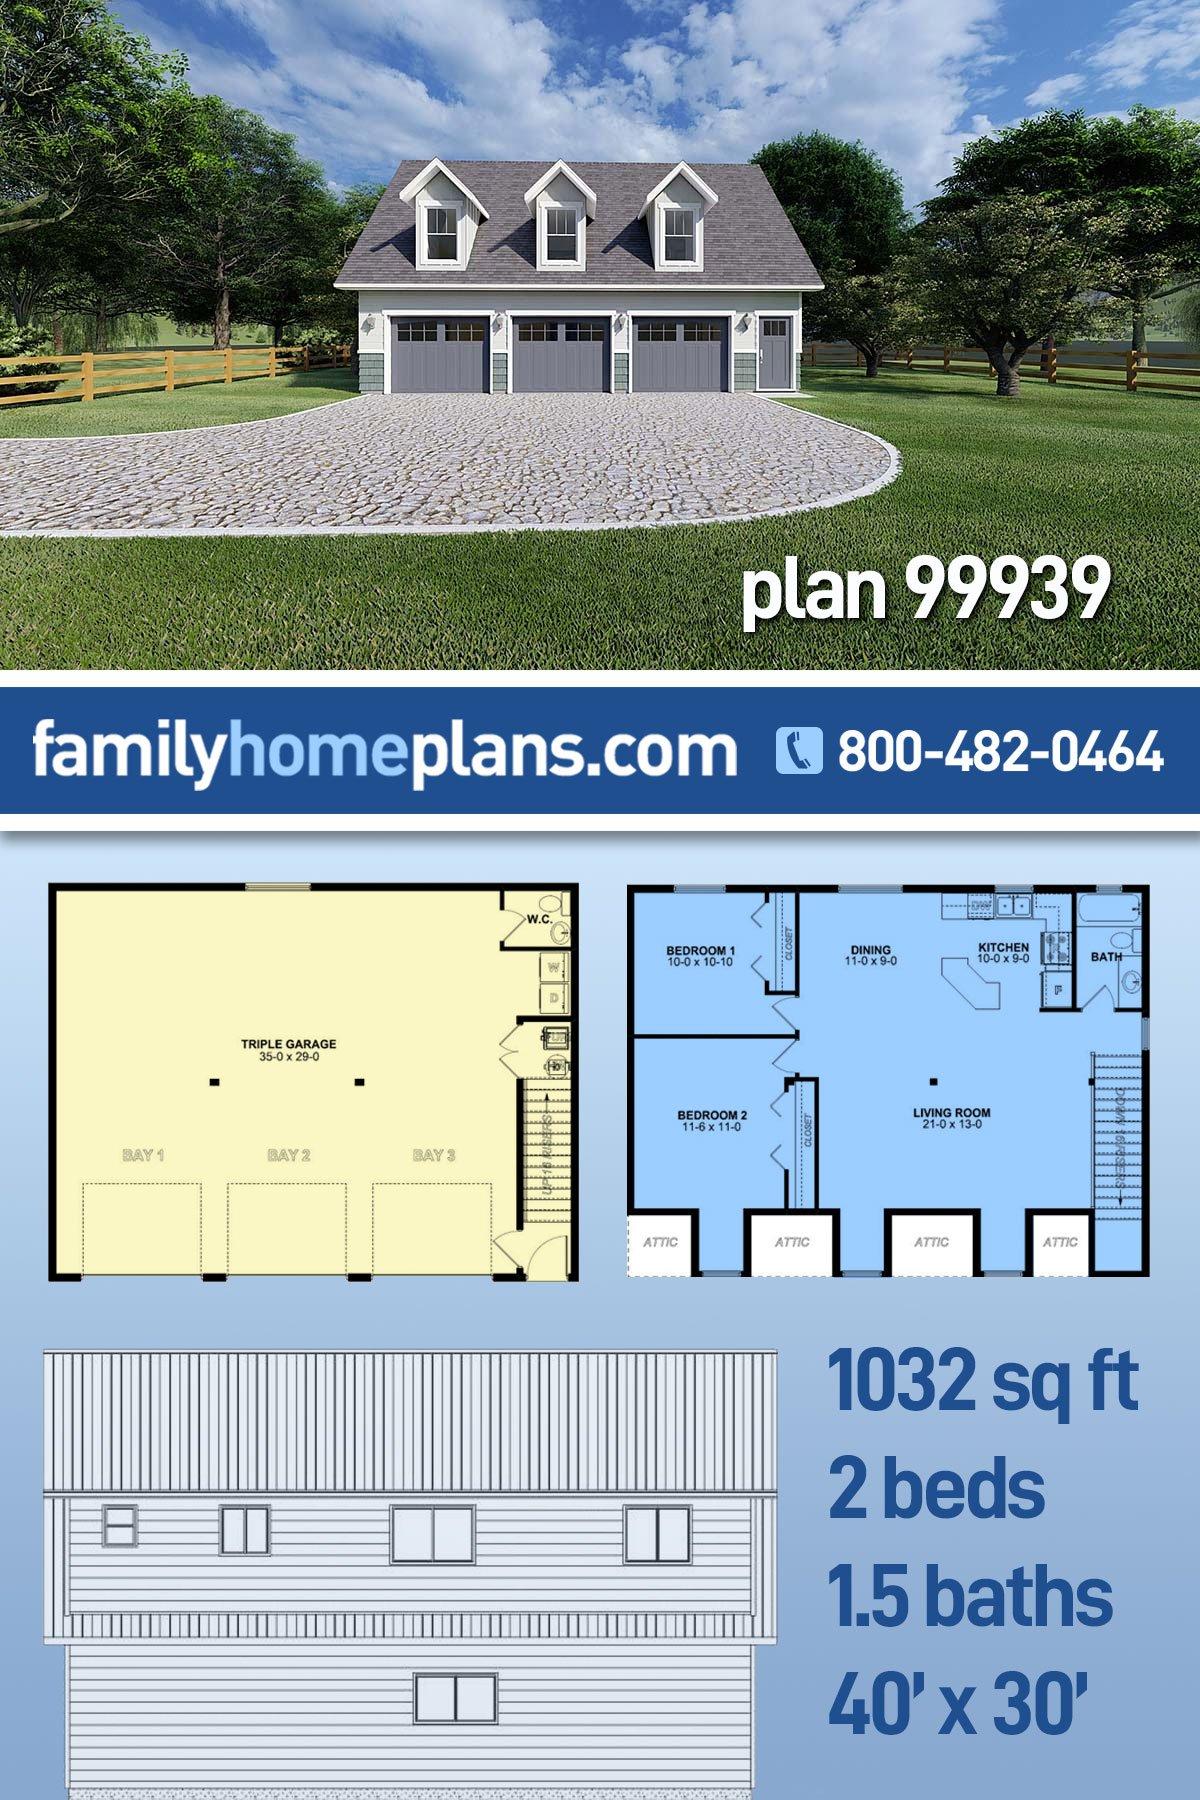 3 Car Garage Apartment Plan 99939 with 2 Beds, 2 Baths